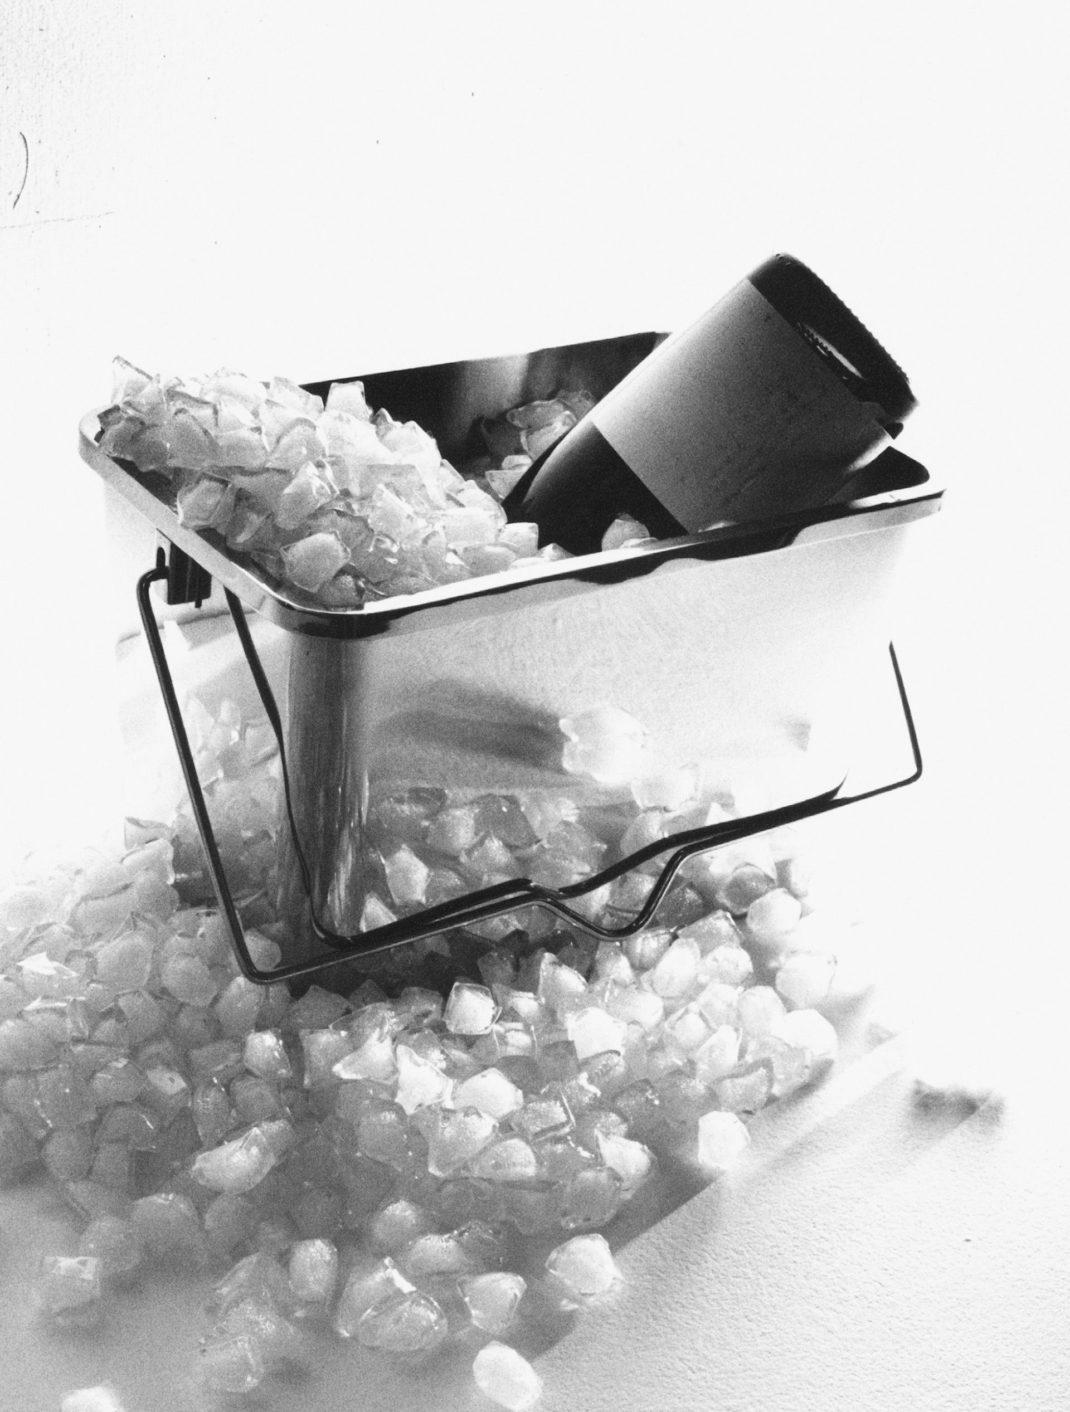 Seau à glace design Maison Martin Margiela